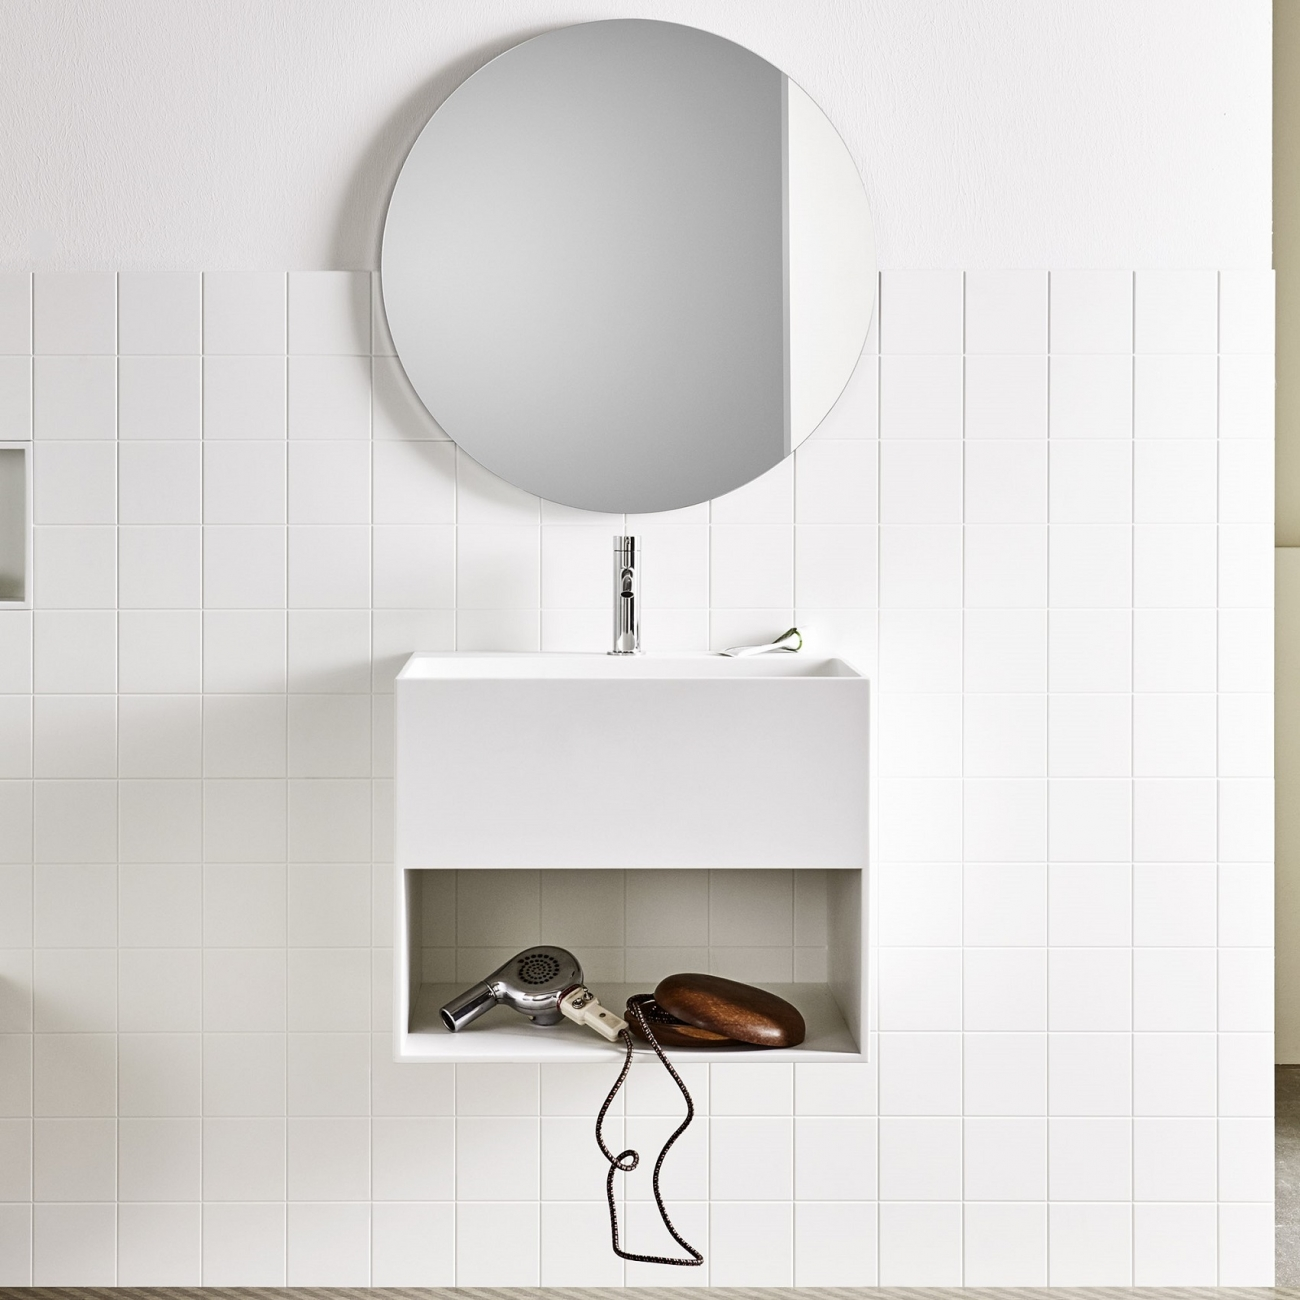 Polaris Designed For Living Srl rexa design unico giorno washbasin - tattahome